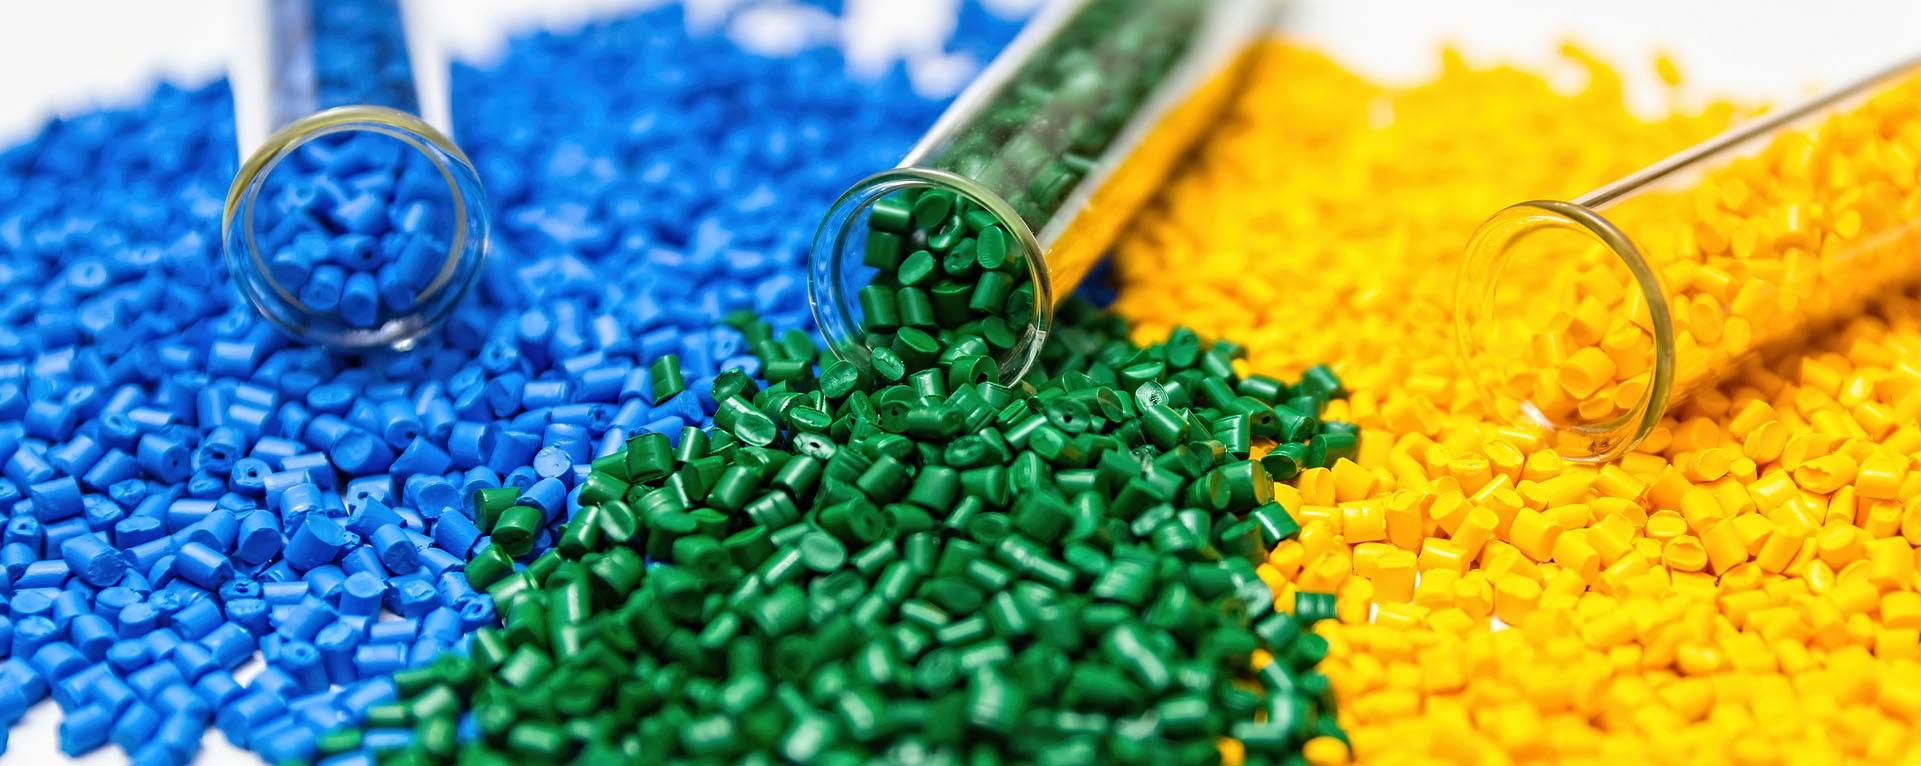 Bespoke Plastic Injection Moulding